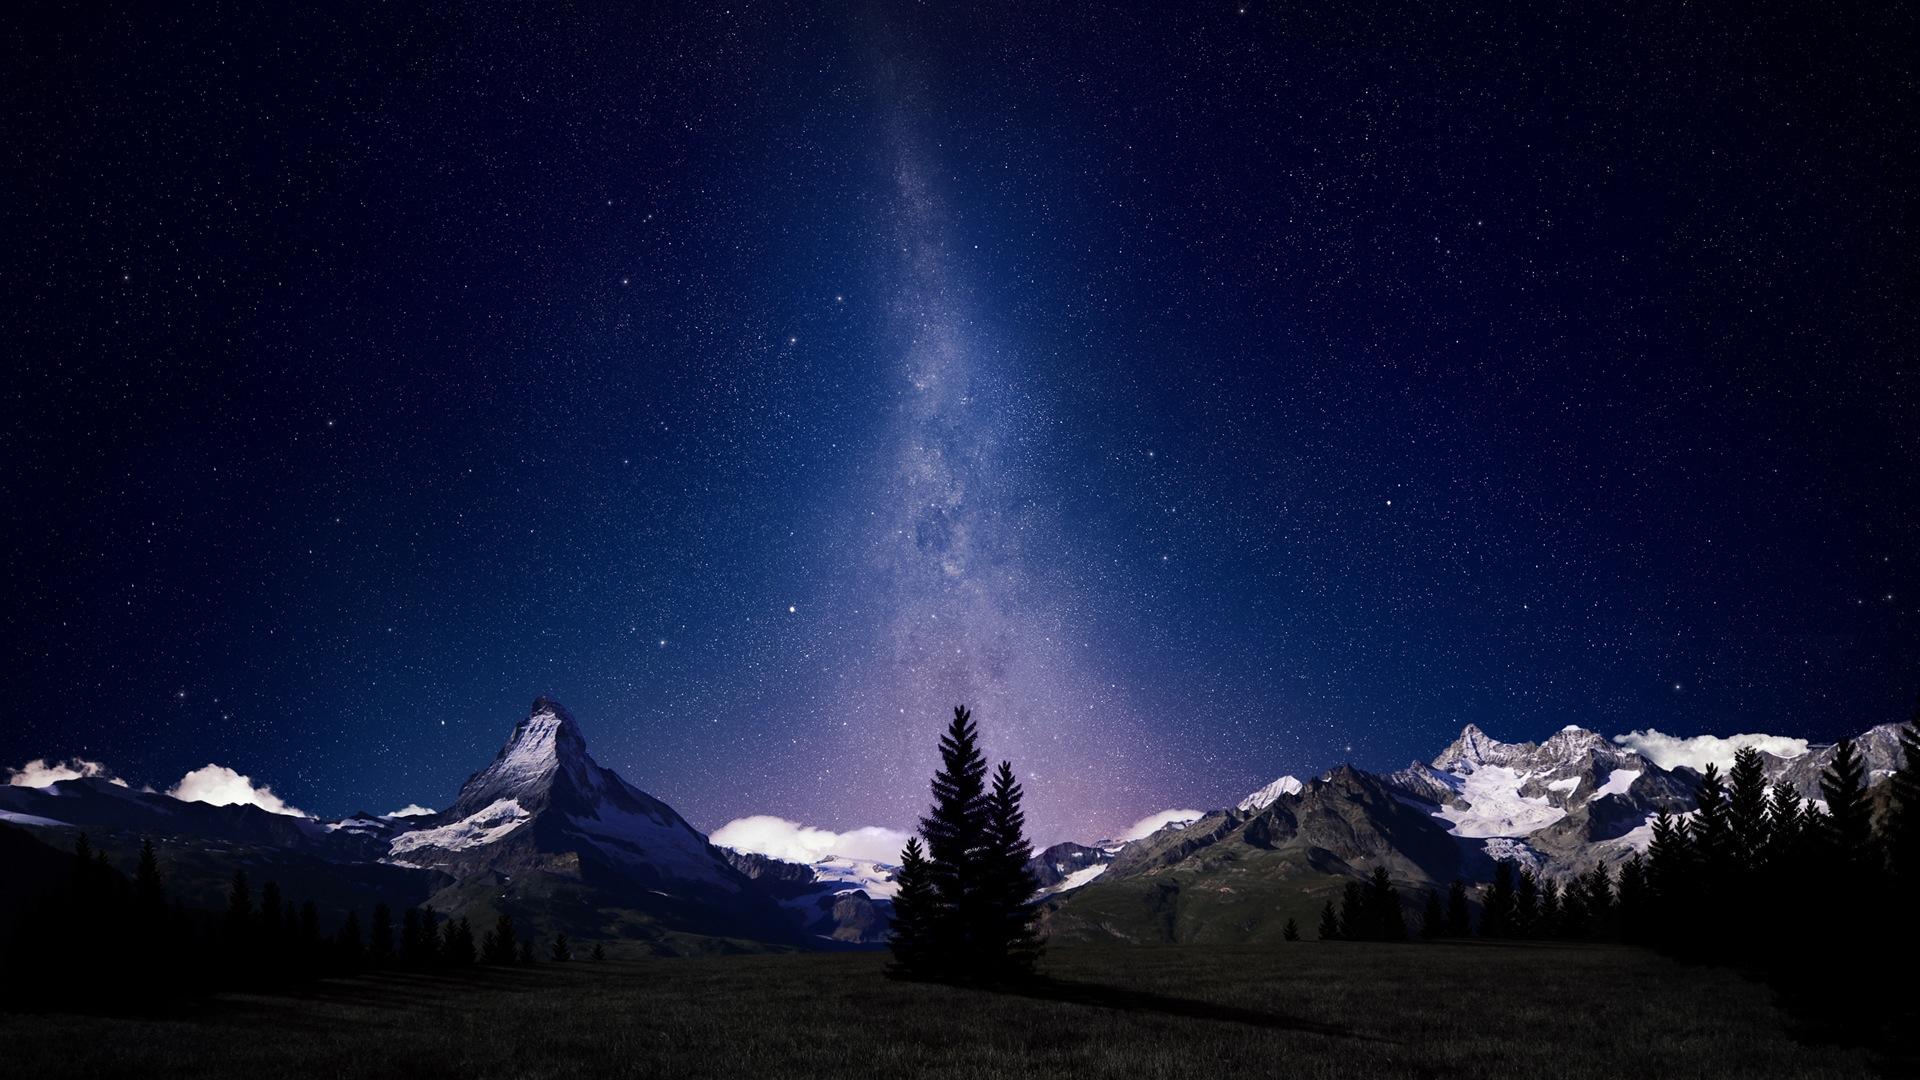 Stunning Milky Way Wallpaper